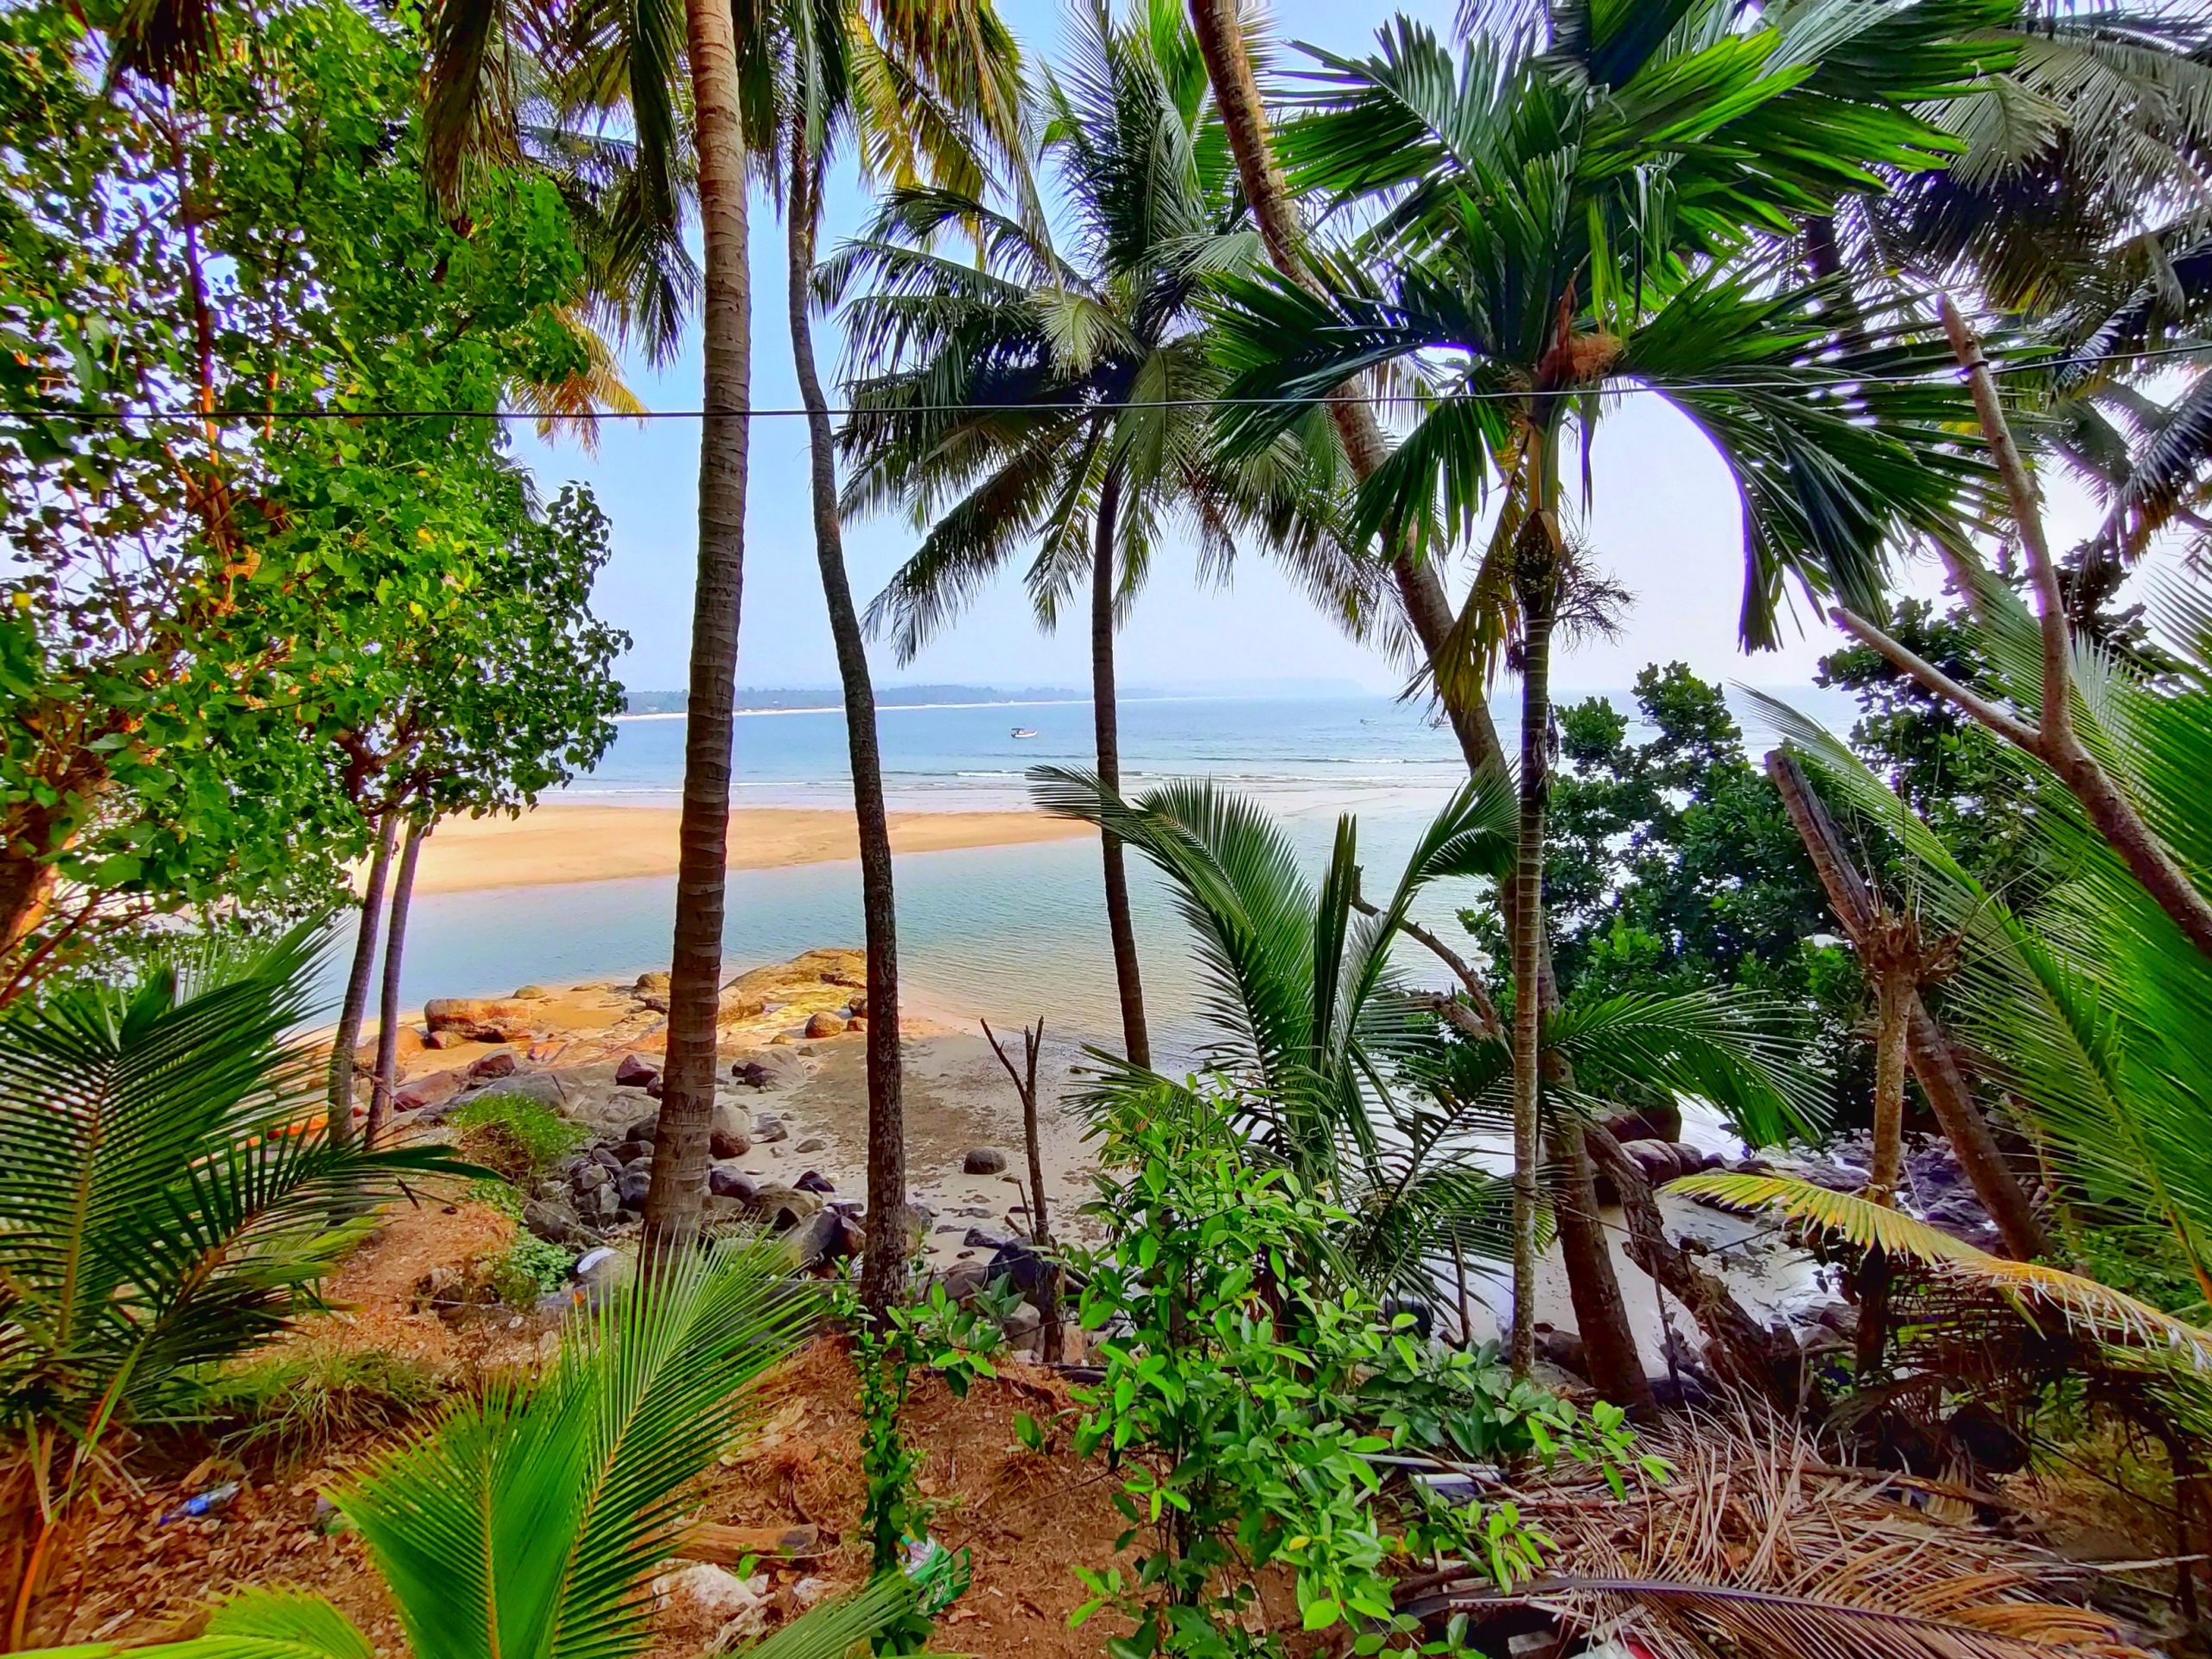 Beautiful Scene of Beach and greenery